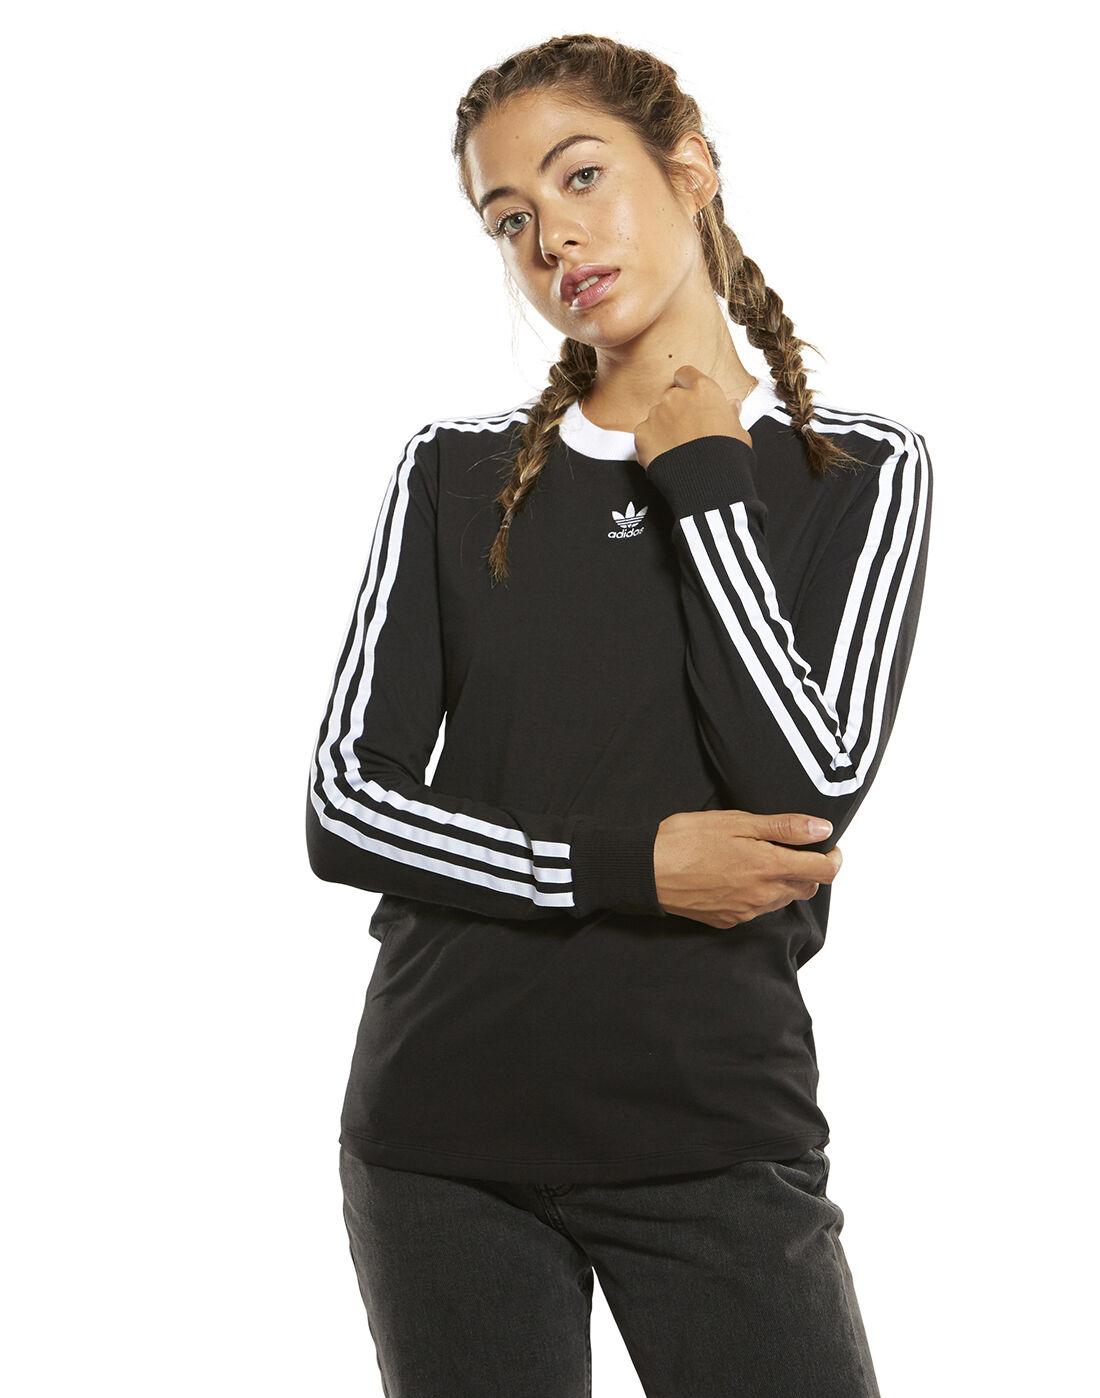 adidas Originals 3 Stripes Damen T Shirt Weiß, Grö | real